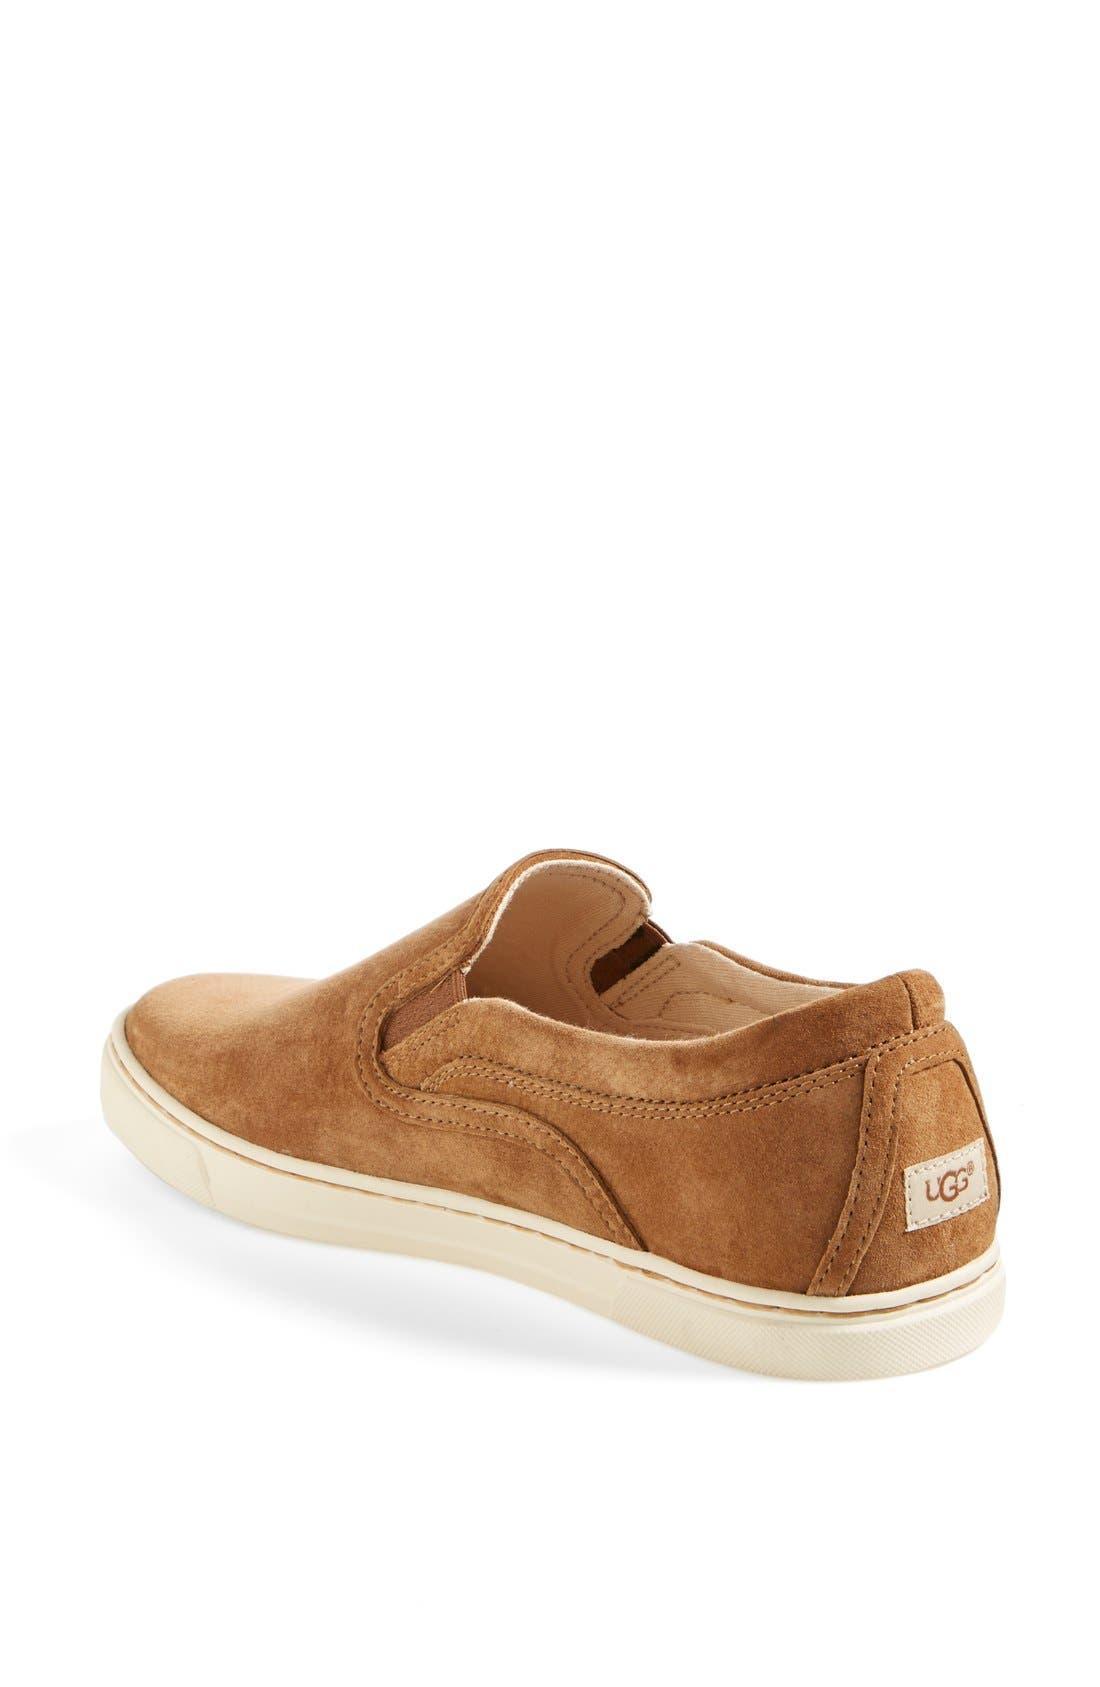 UGG<SUP>®</SUP>, Fierce Water Resistant Suede Slip-On Sneaker, Alternate thumbnail 2, color, 219